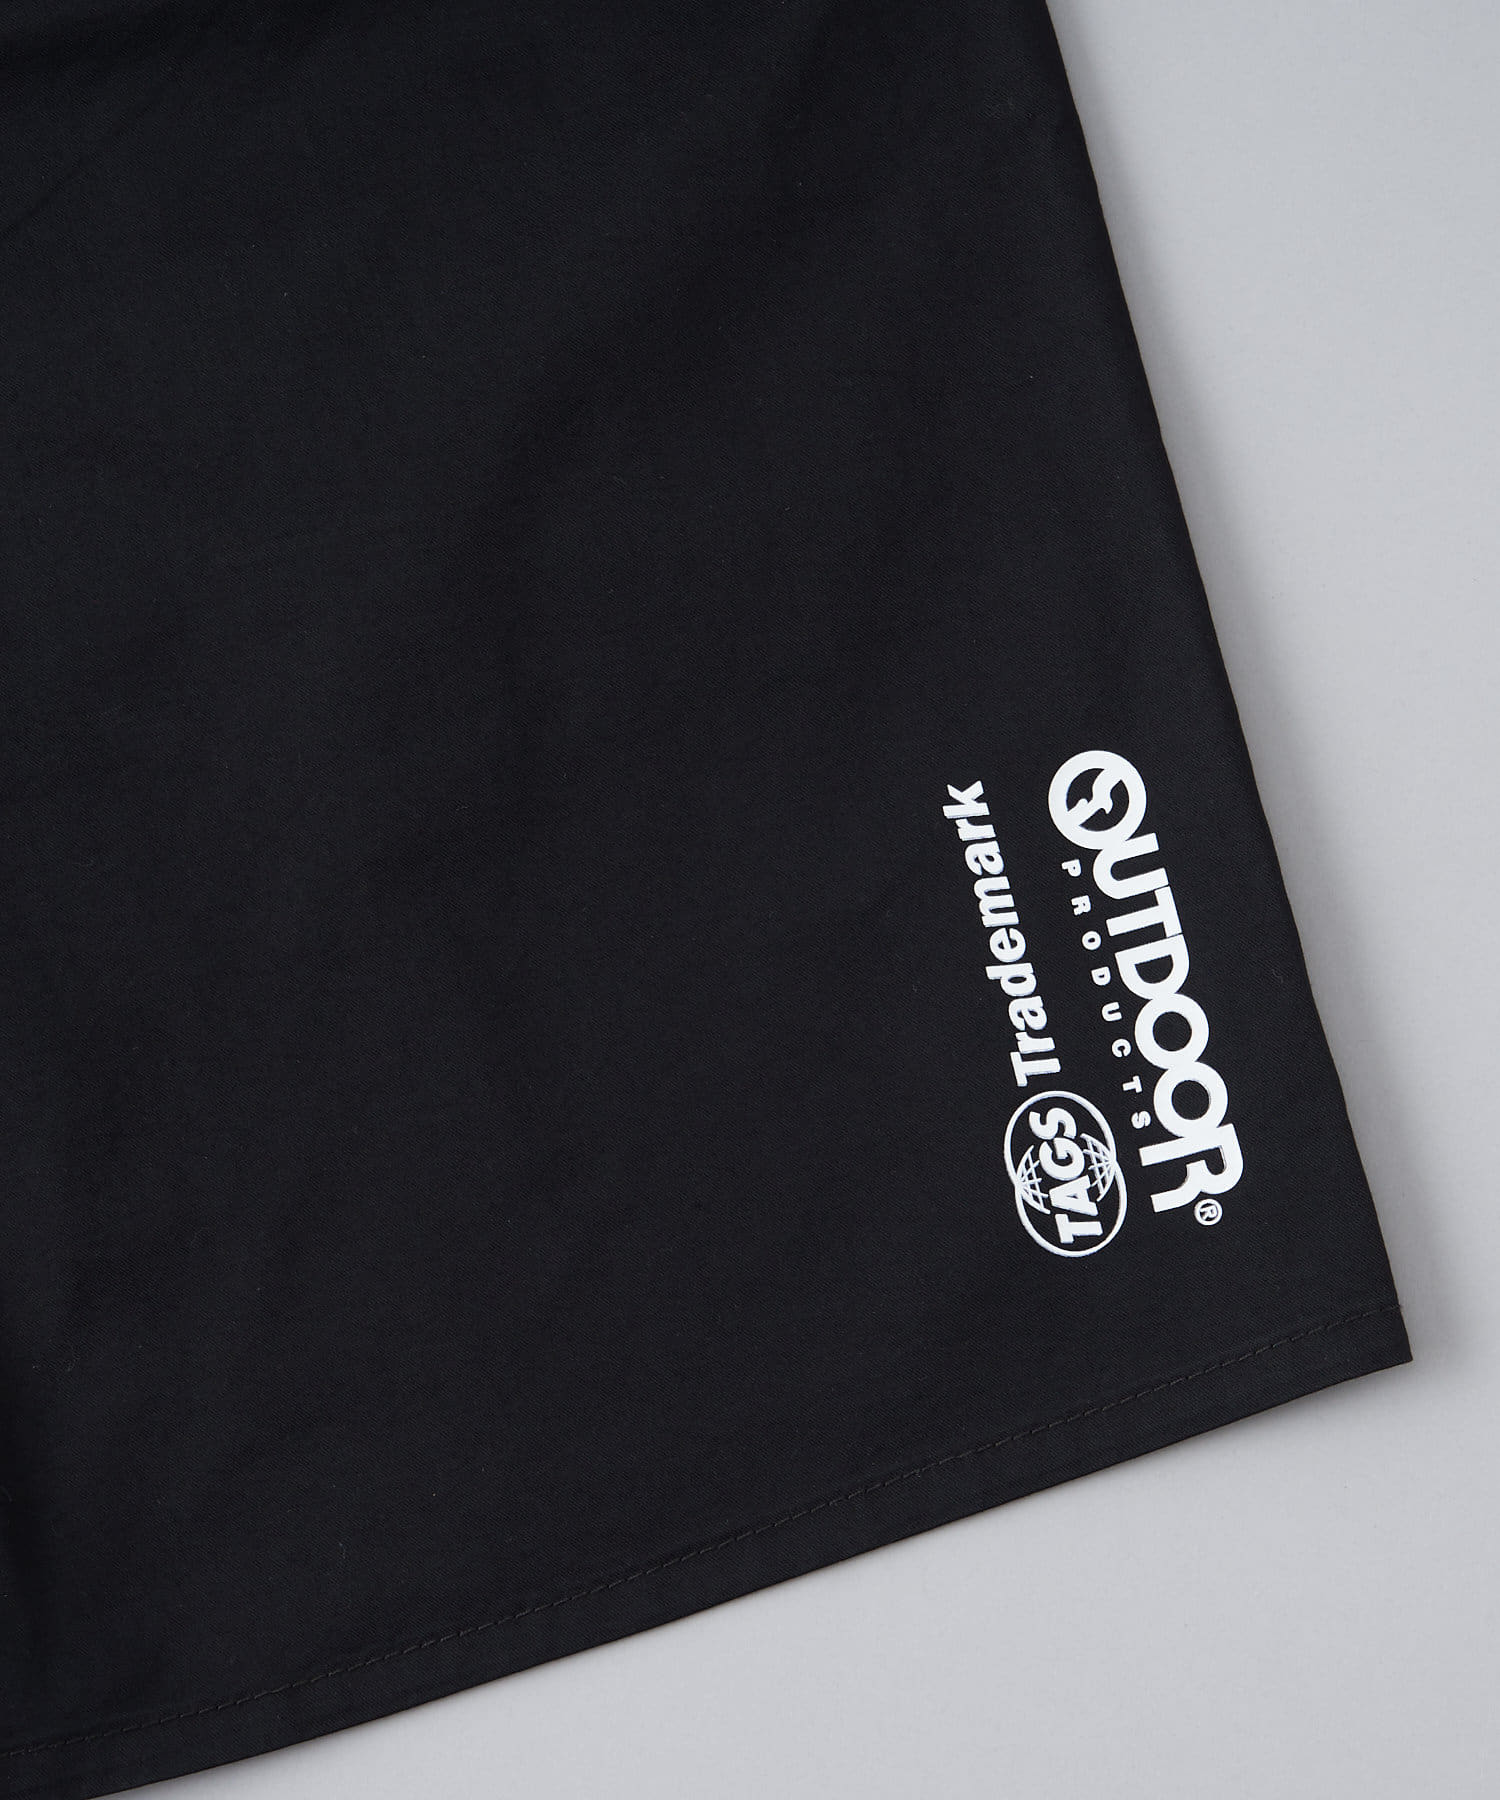 CIAOPANIC(チャオパニック) 【TAGS™×OUTDOOR PRODUCTS】バギーズショートパンツ